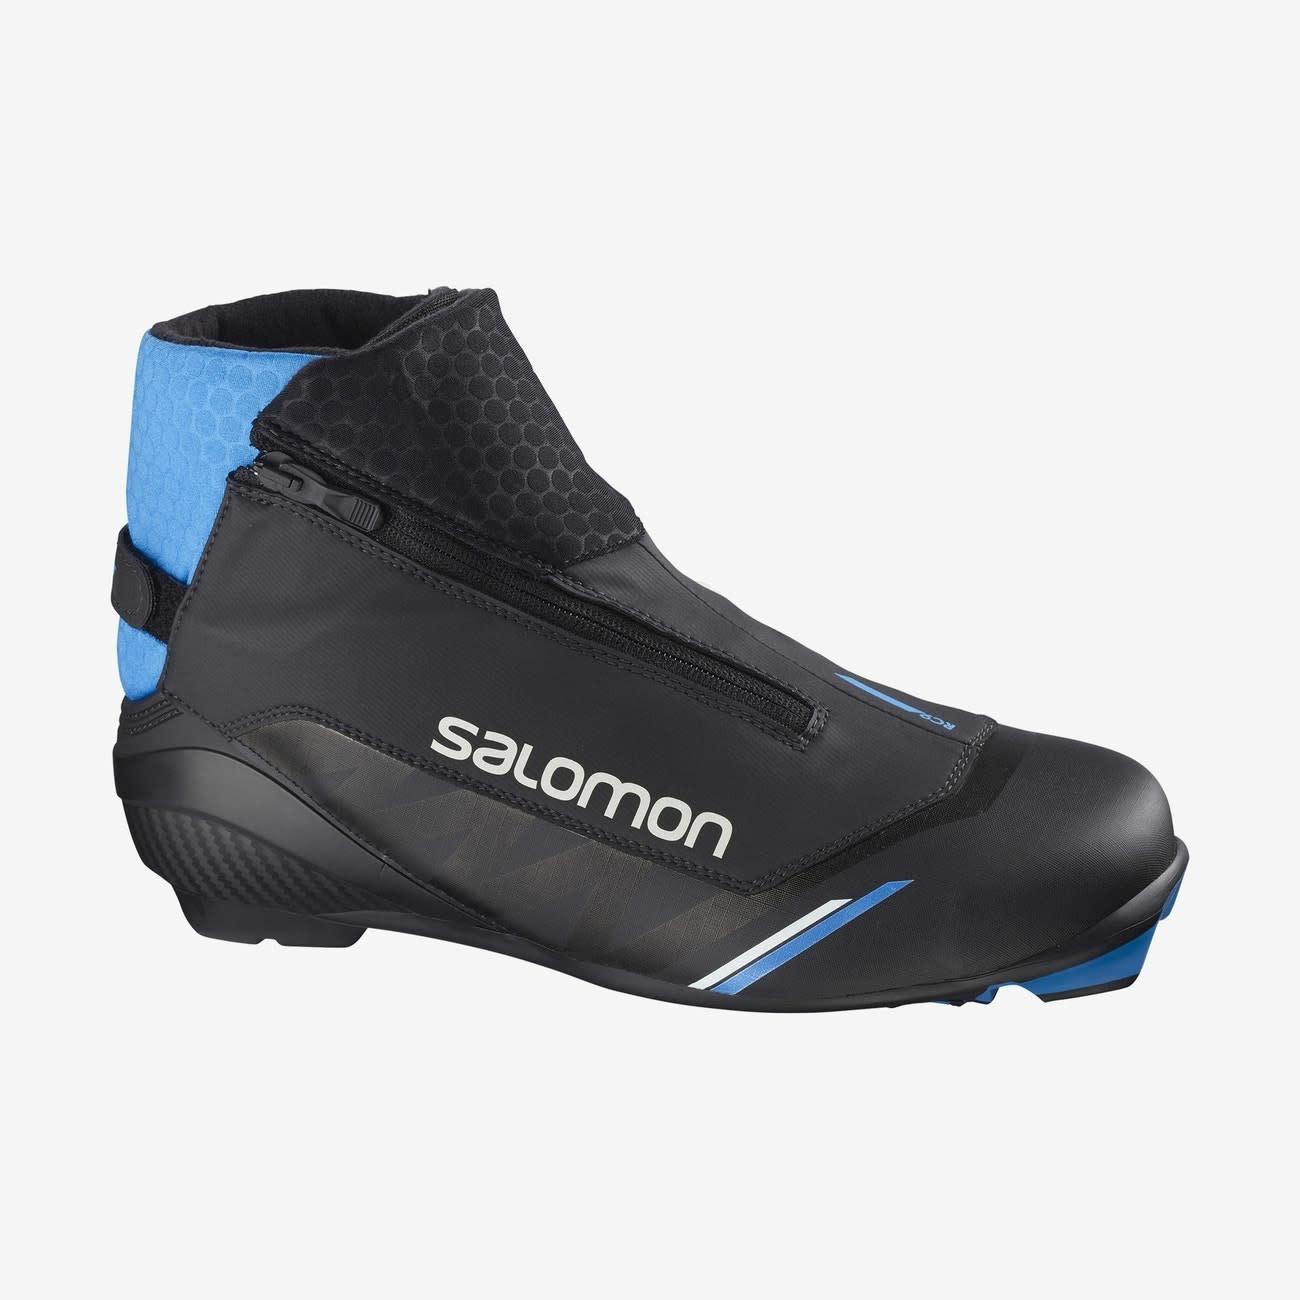 Botte Salomon RC 9 Nocturne Prolink 2022